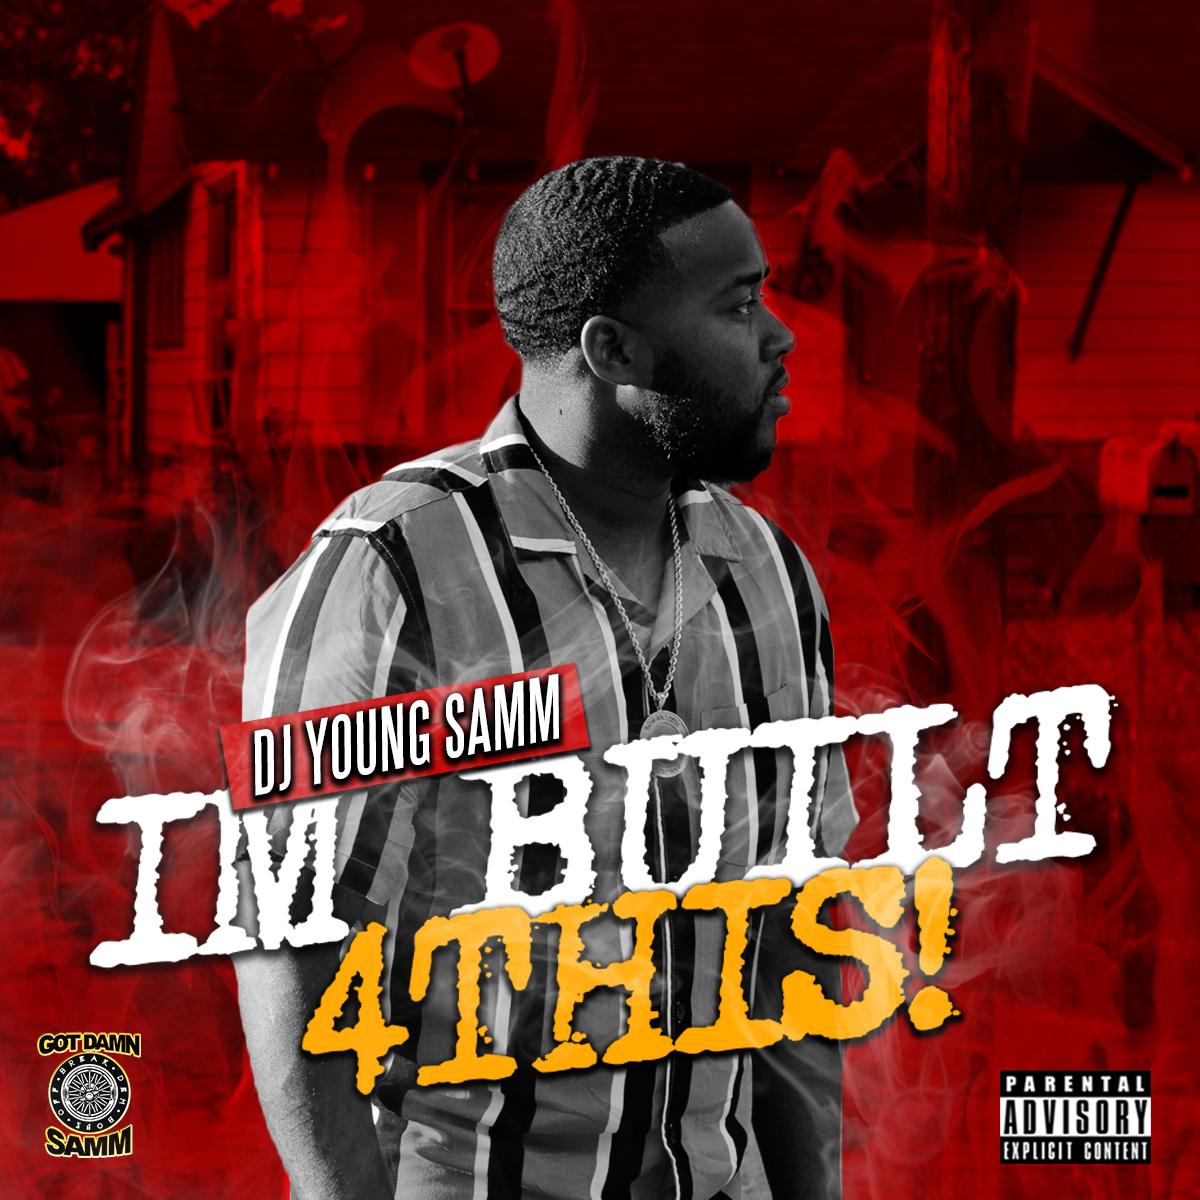 Dj Young Samm - I'm Built 4 This - DJ YOUNG SAMM